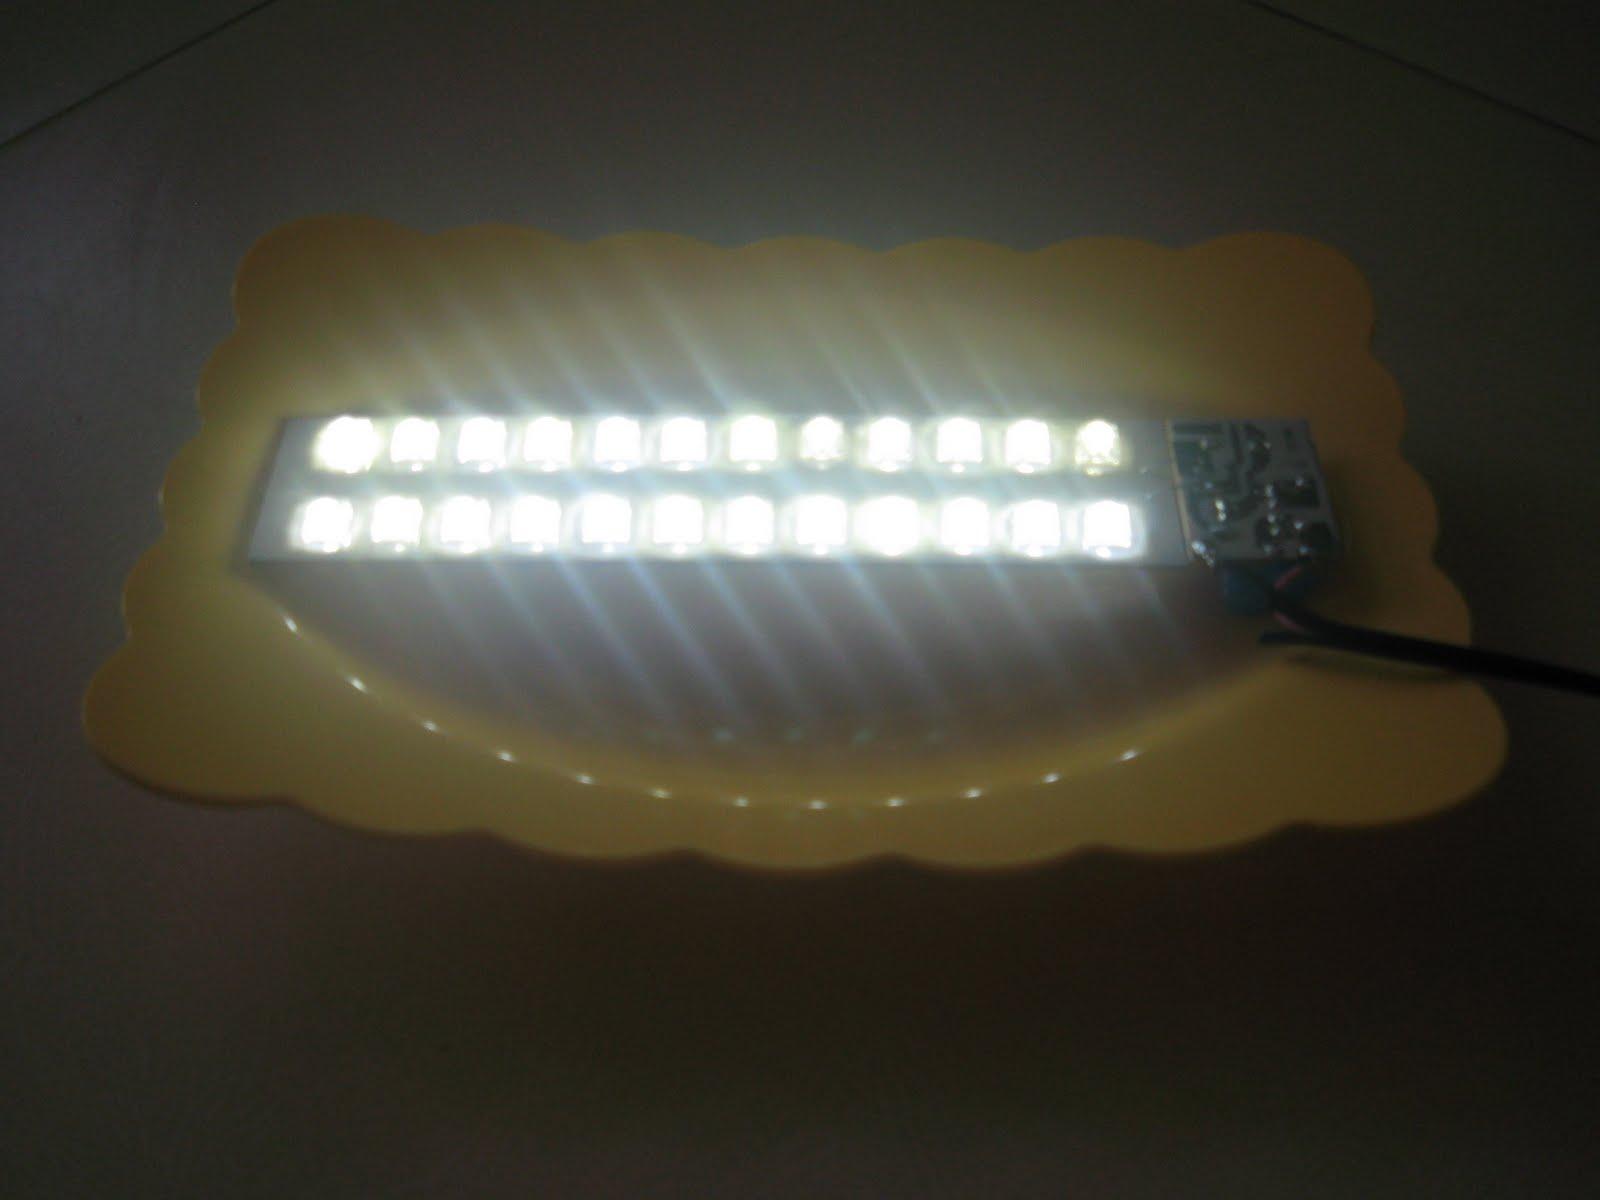 Ini adalah versi modifikasi dari rangkaian,Super terang LED Malam ...